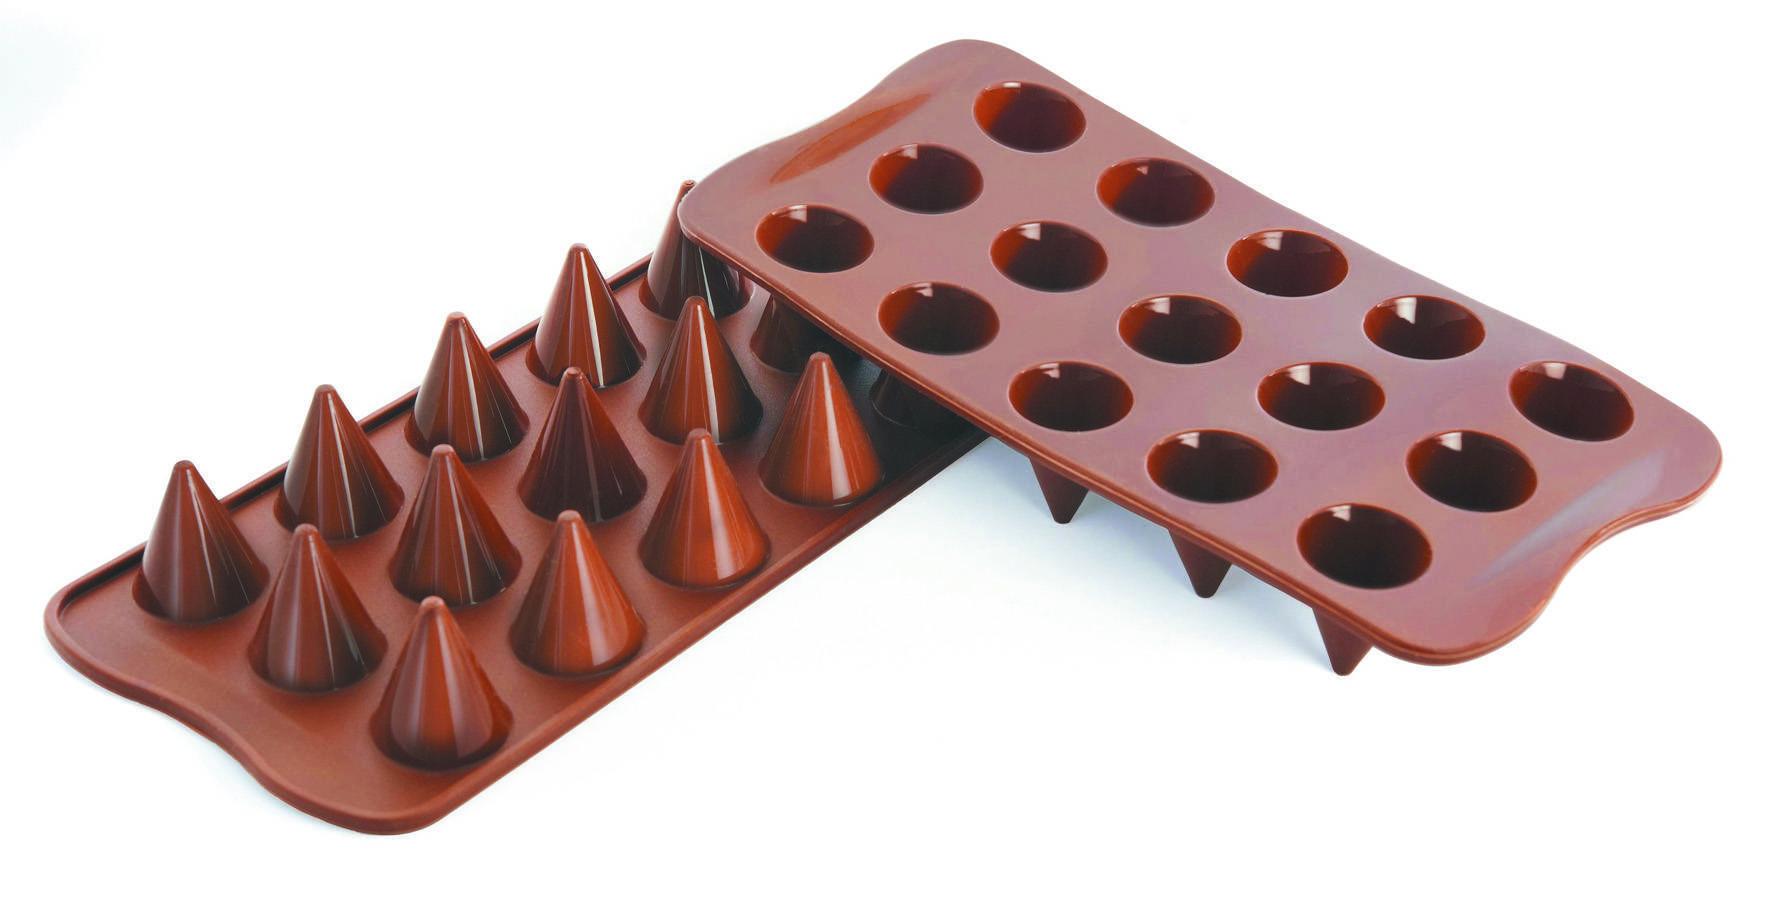 Kono Chocoflex